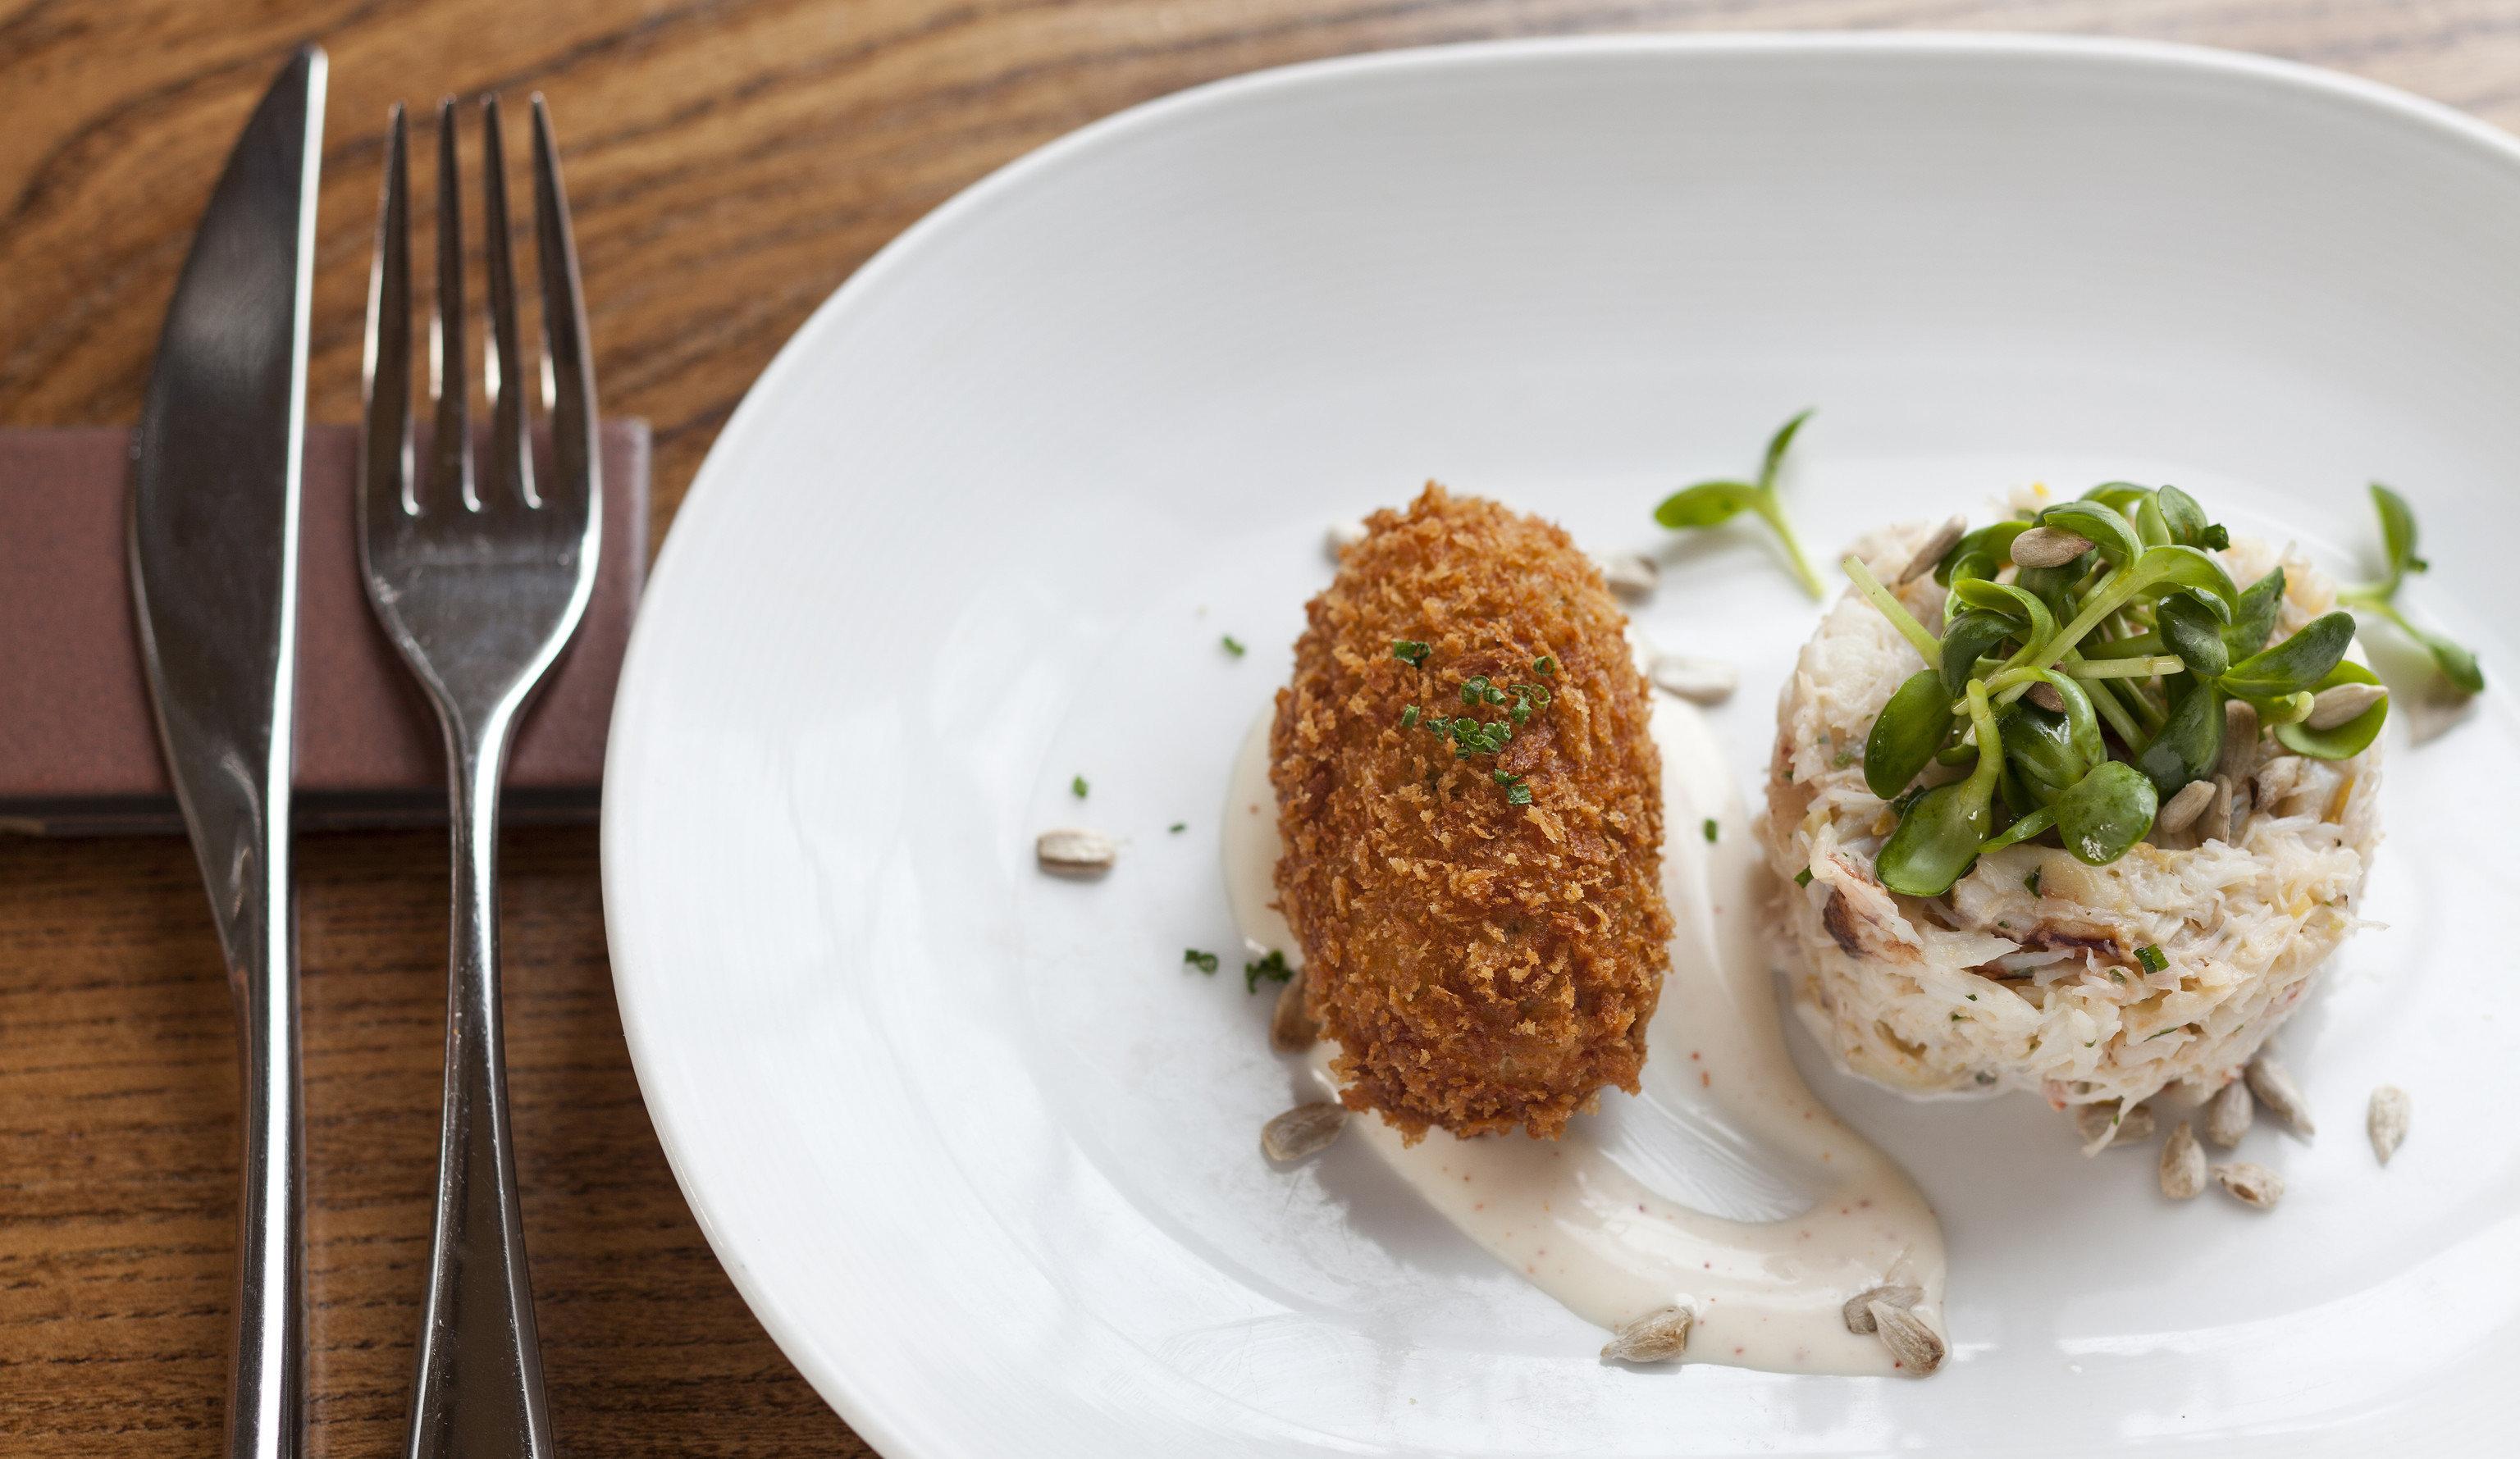 plate food white fork fish cuisine meat vegetable piece de resistance